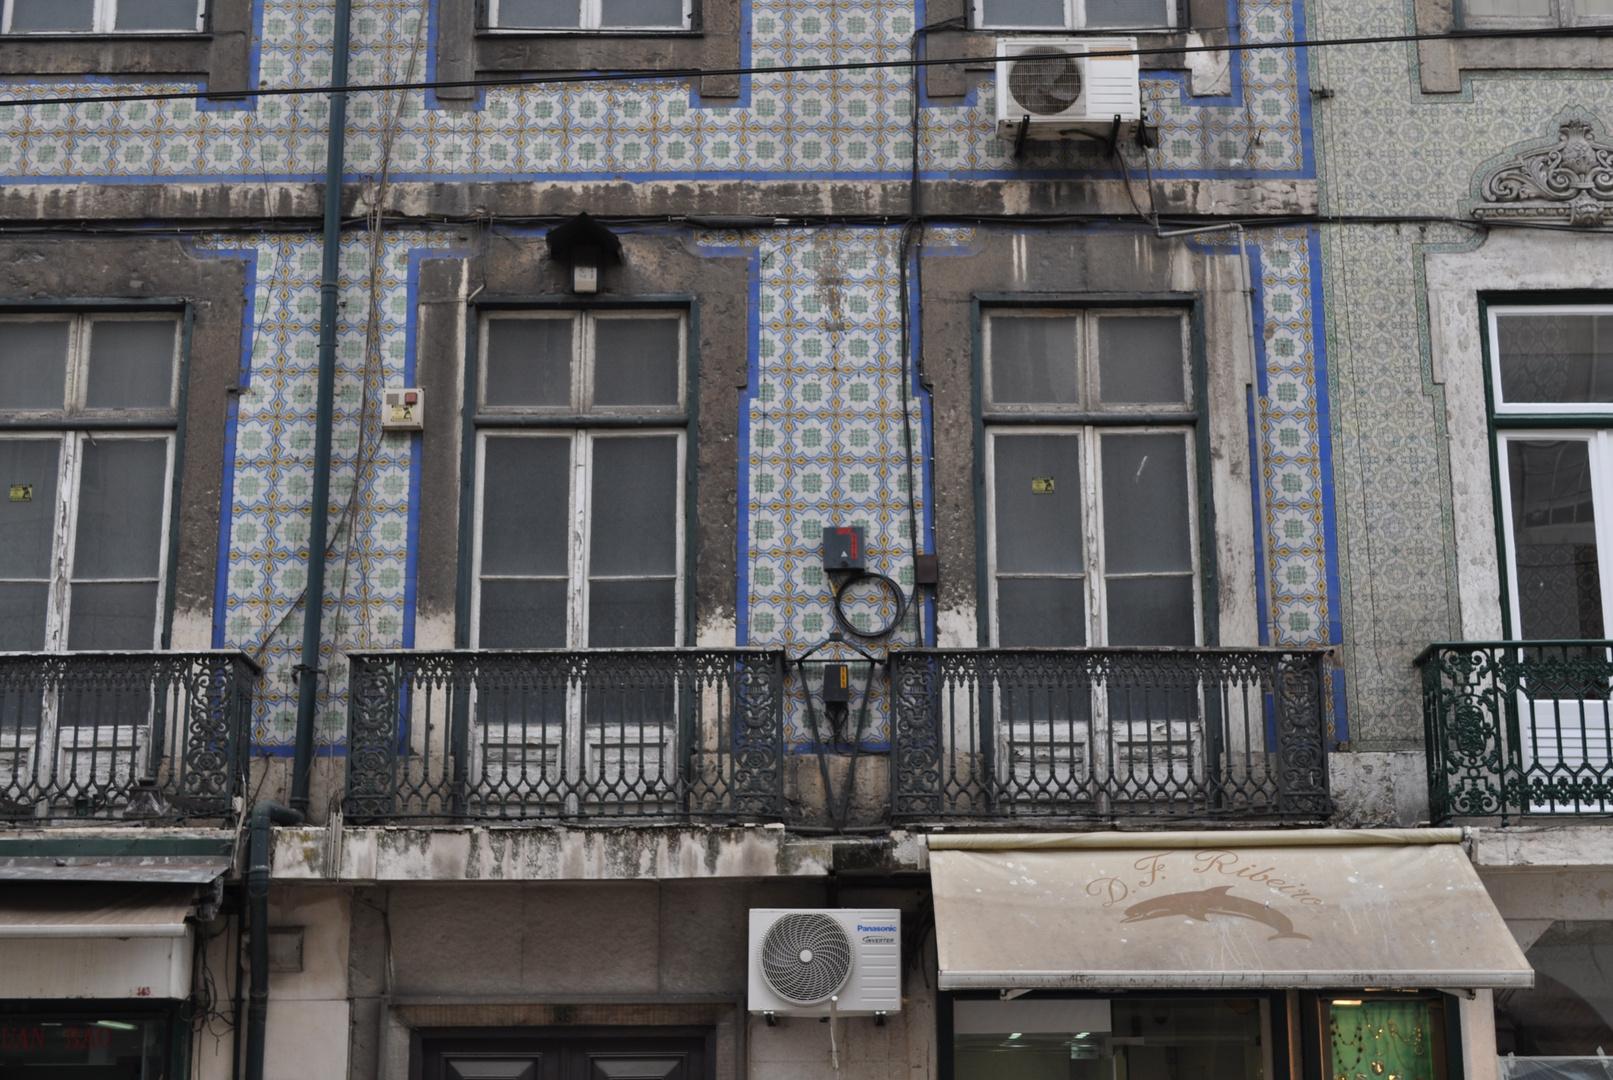 Haustechnik auf Fassade